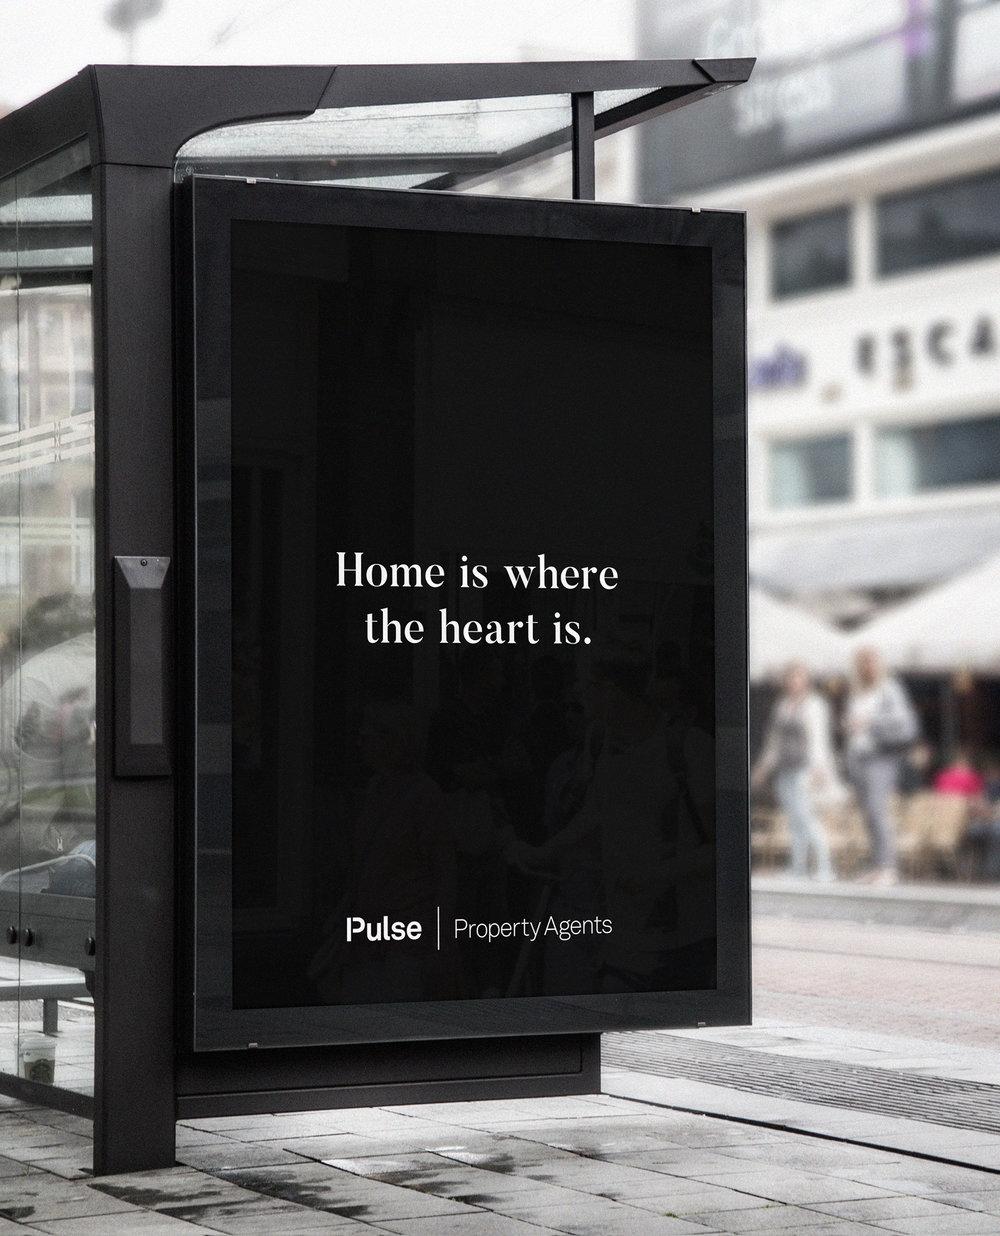 Brand awareness advertisement